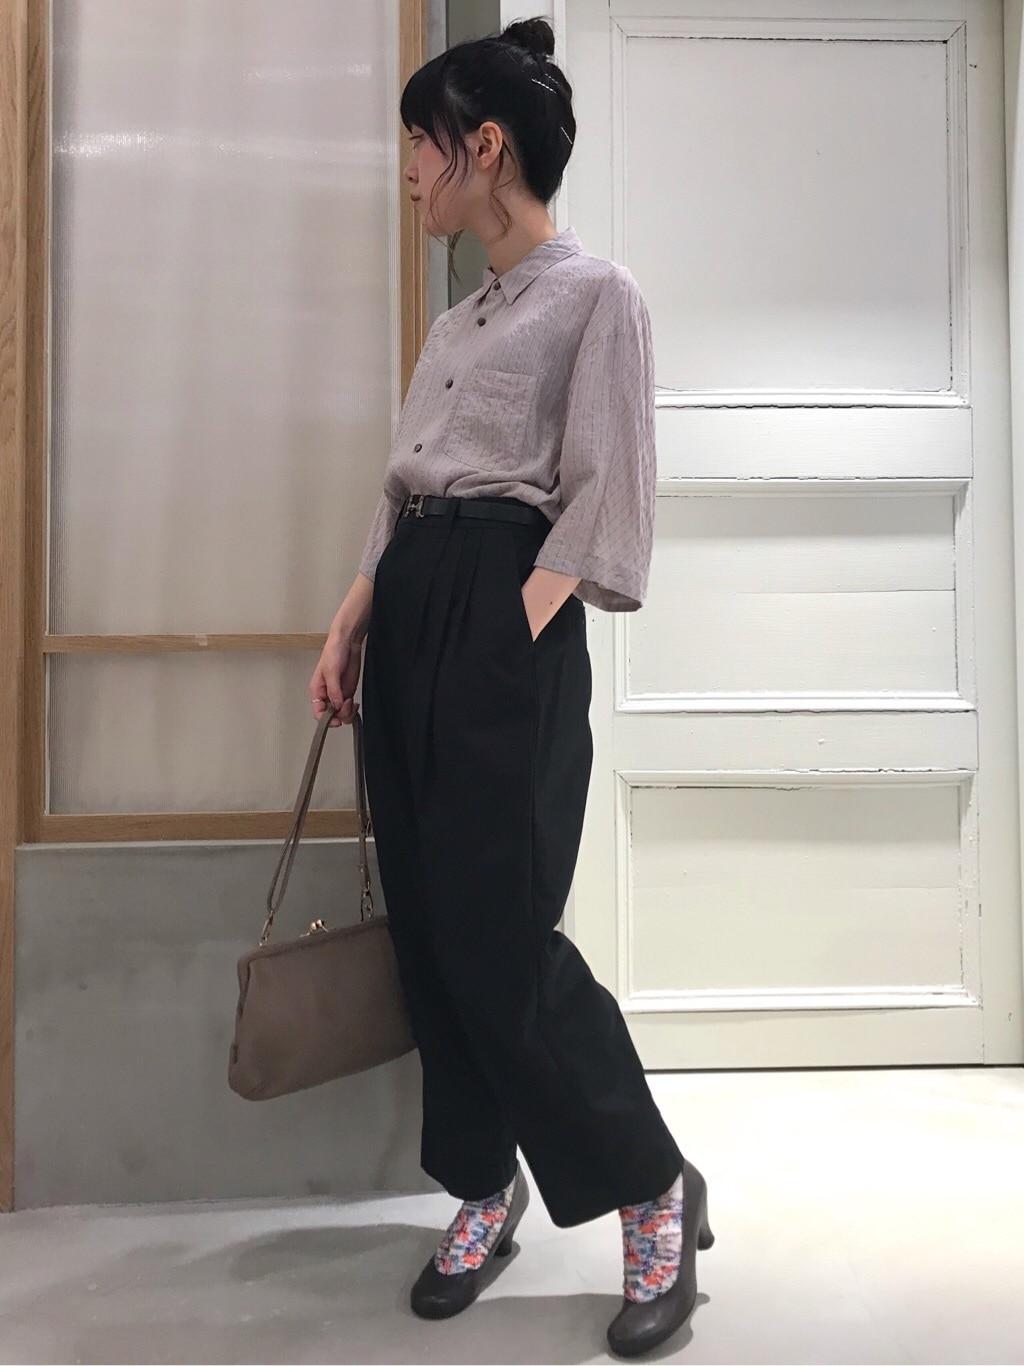 bulle de savon 渋谷スクランブルスクエア 身長:153cm 2020.04.07